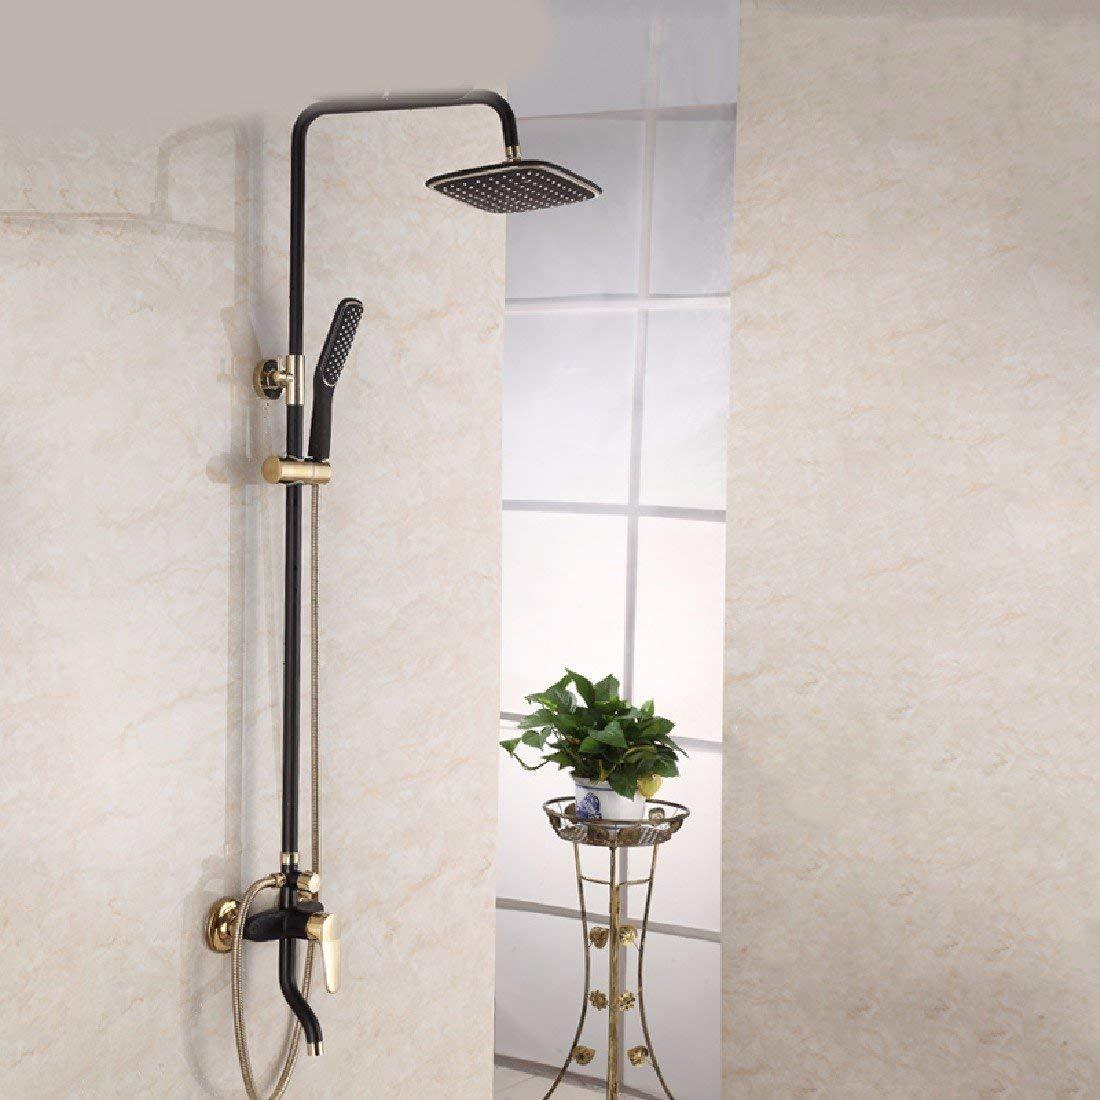 Home Improvement Cold And Hot Mixer Faucet Shower Tap Set Bathroom Antique Sprinkler Suit All Copper Vintage Antique Bronze Shower Faucet